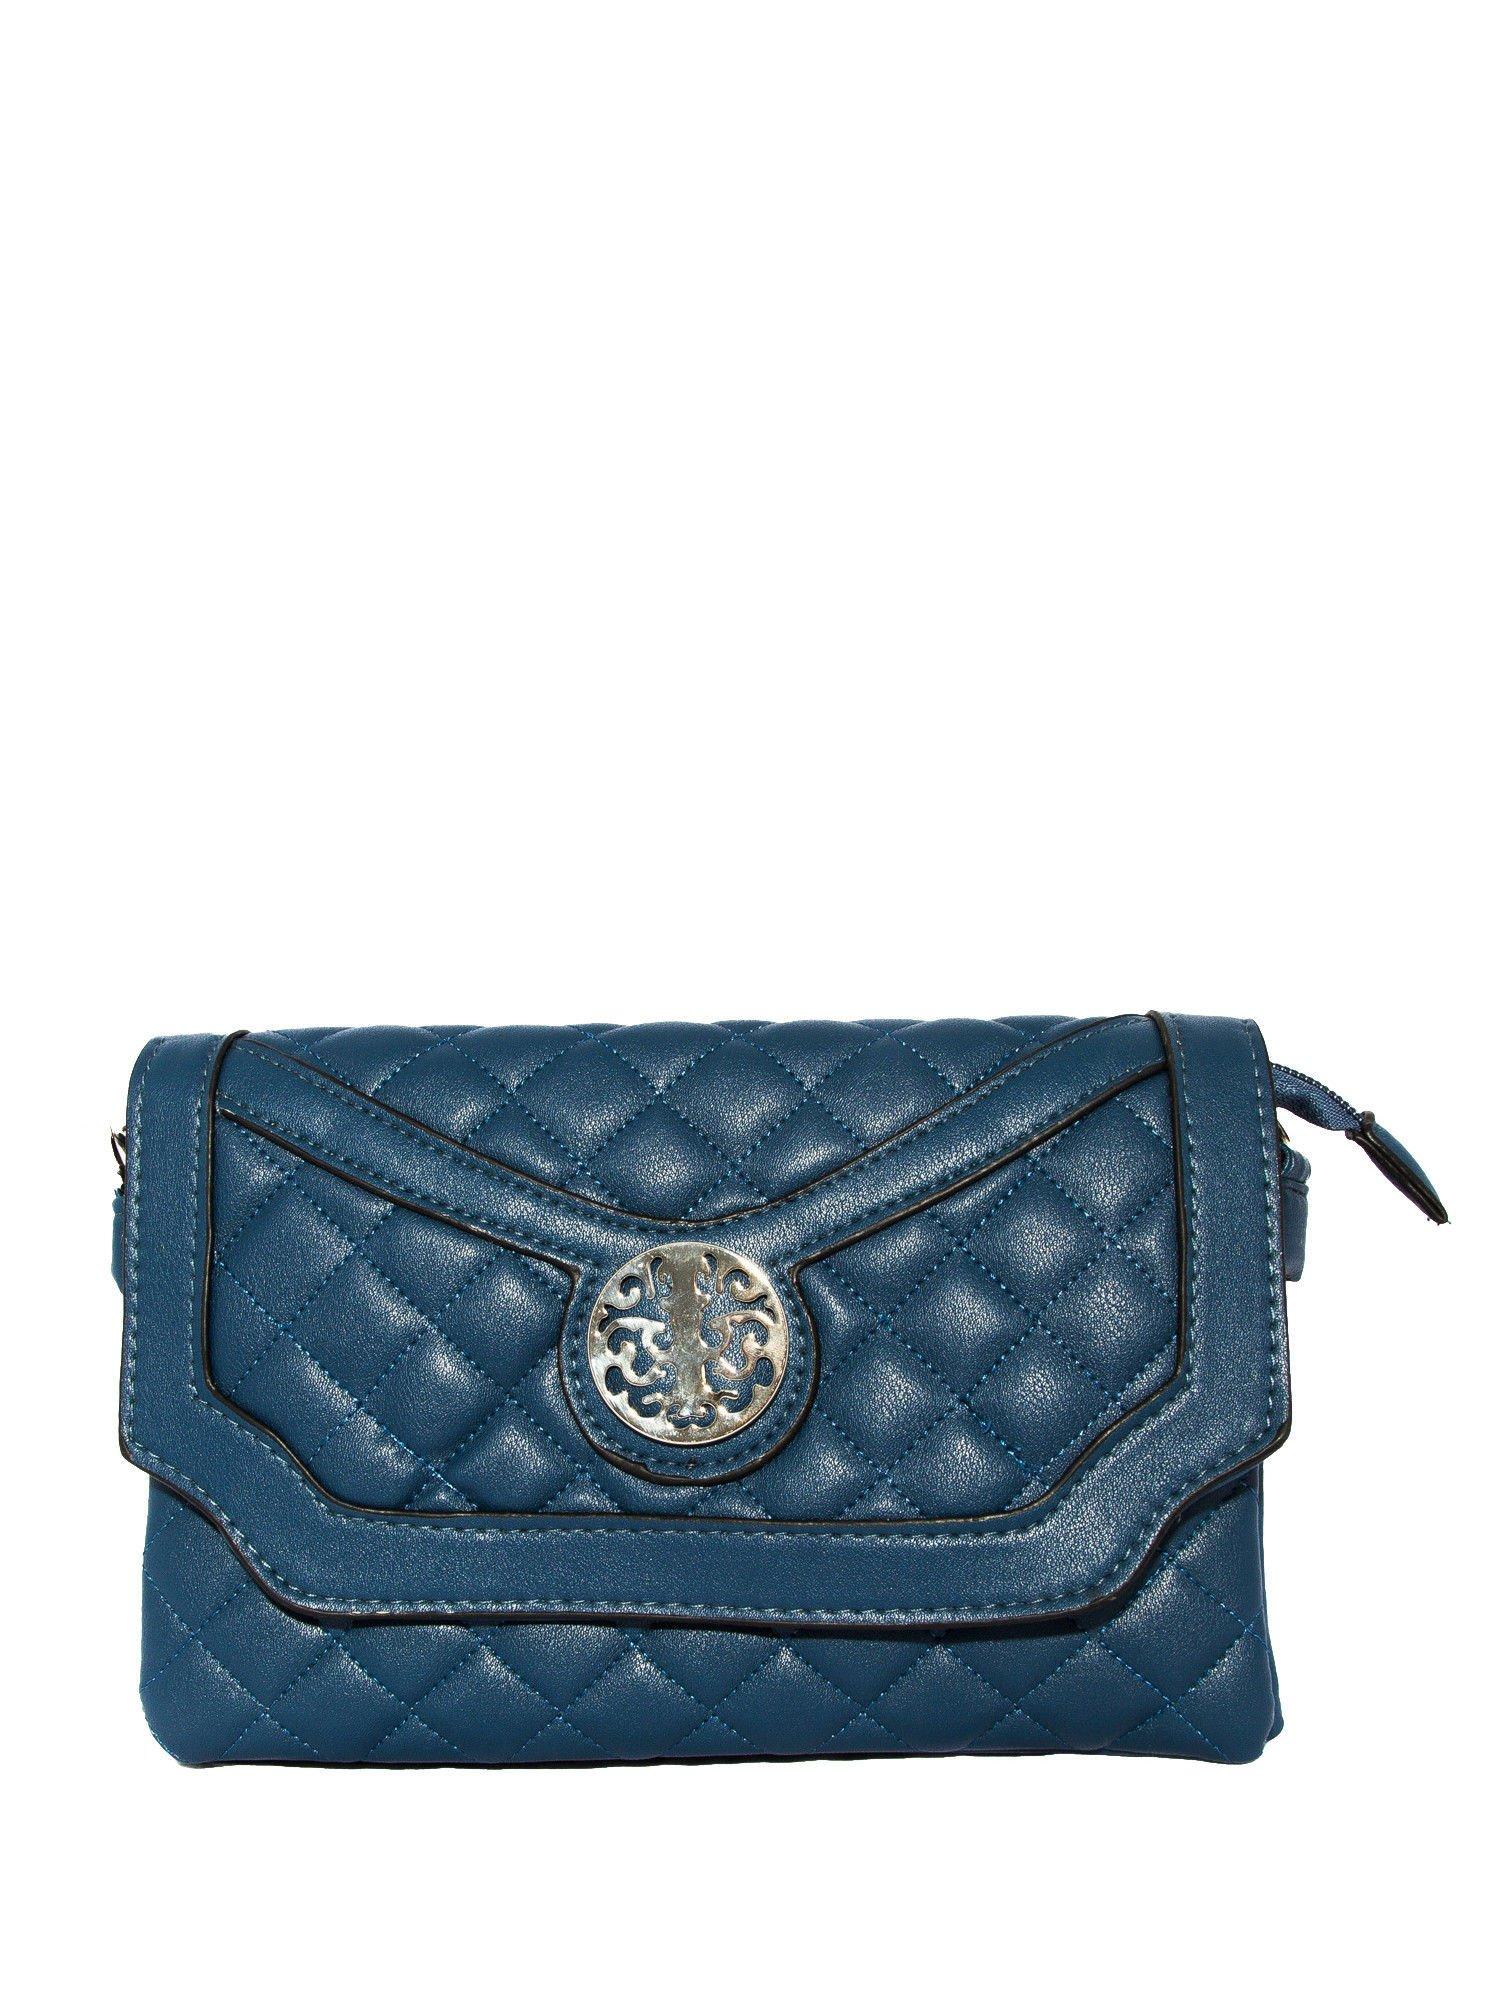 Ciemnoniebieska pikowana torba typu listonoszka                                  zdj.                                  1